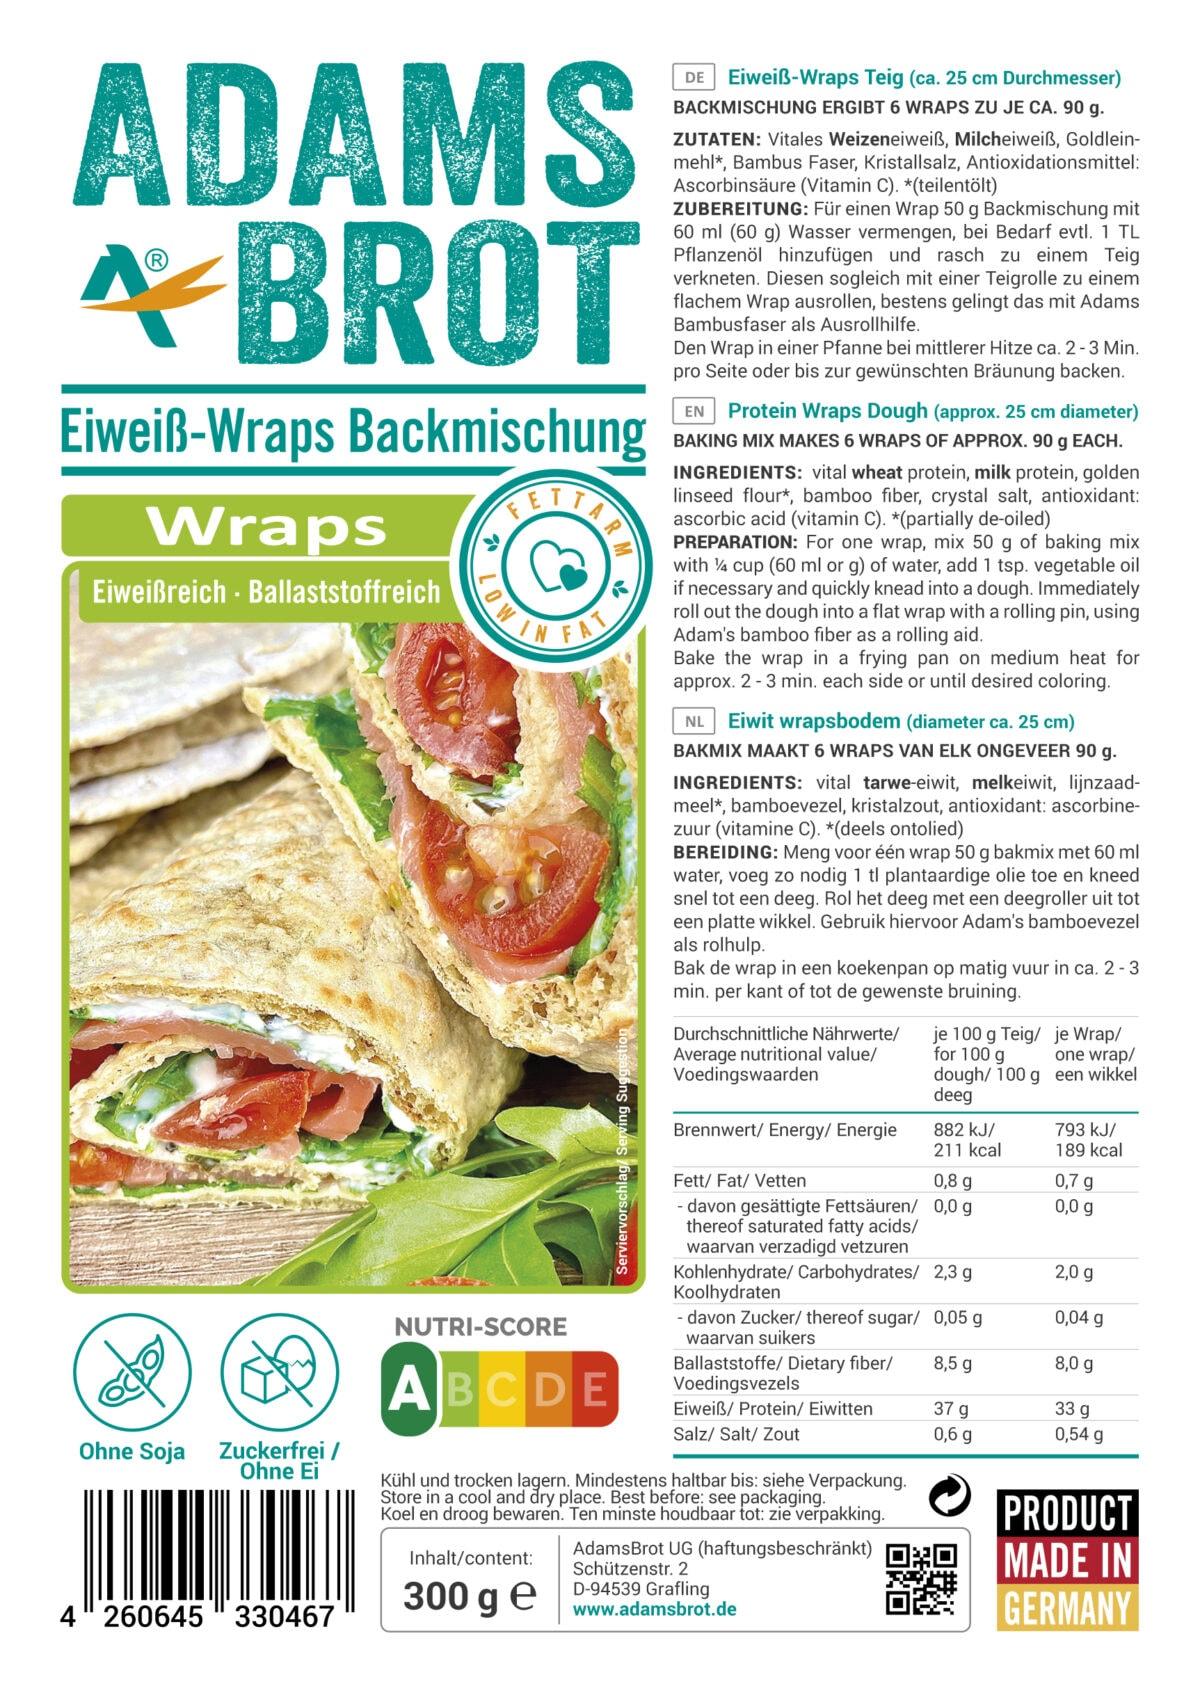 Wrap Low Carb Adams Brot